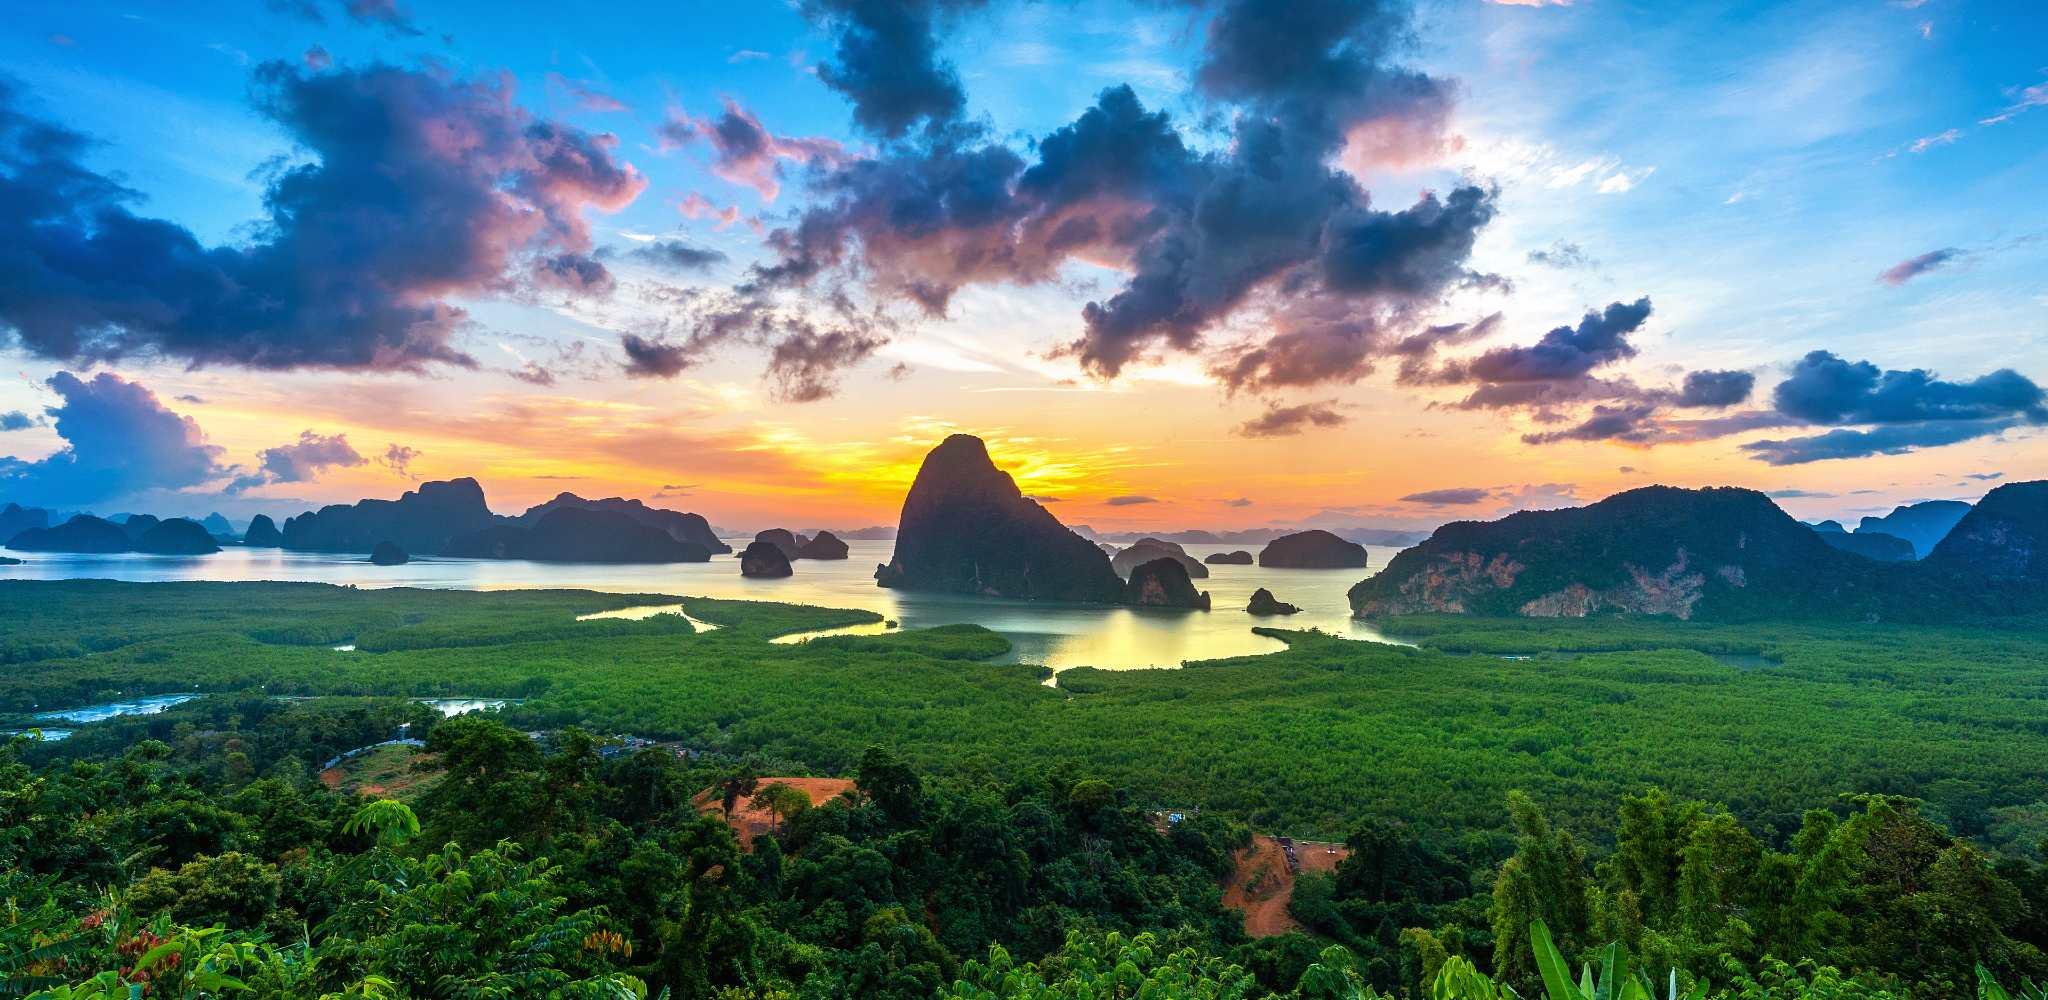 View of Phang Nga Bay from the Samet Nangshe Viewpoint